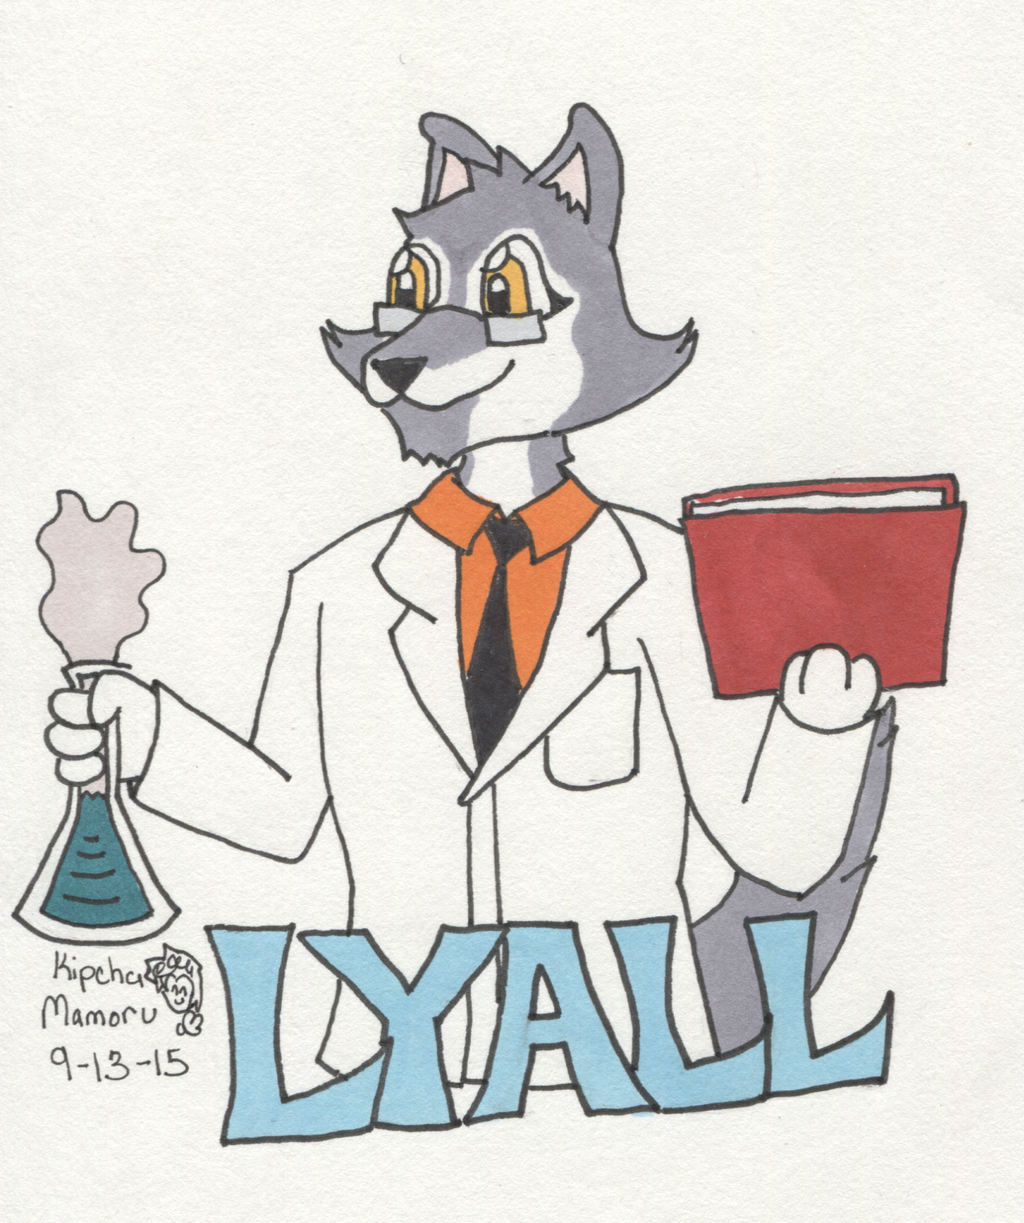 Lyall Badge - 2015